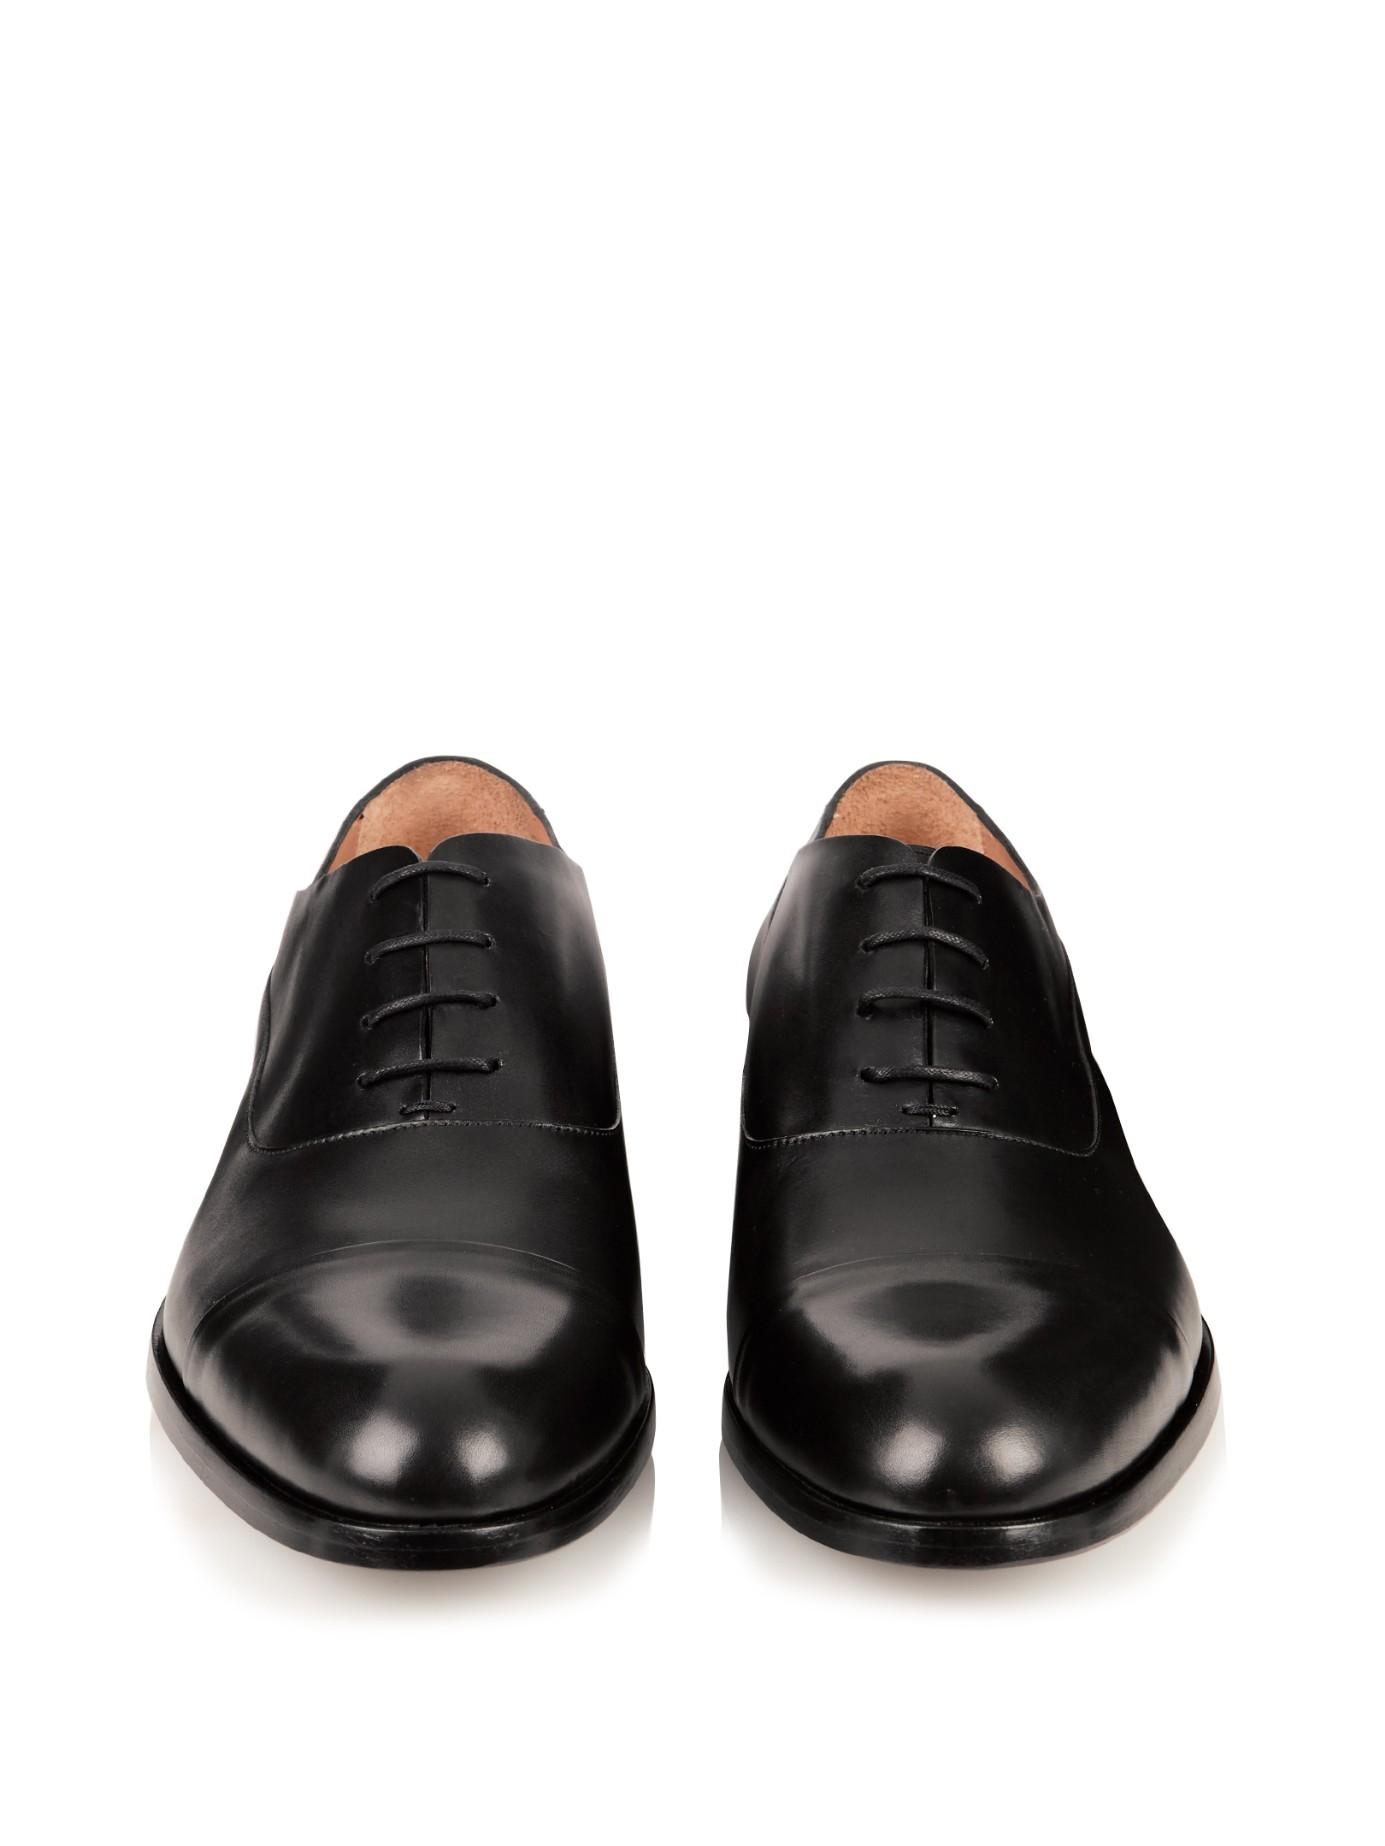 Paul Smith Oxford shoes 8Zrp82v